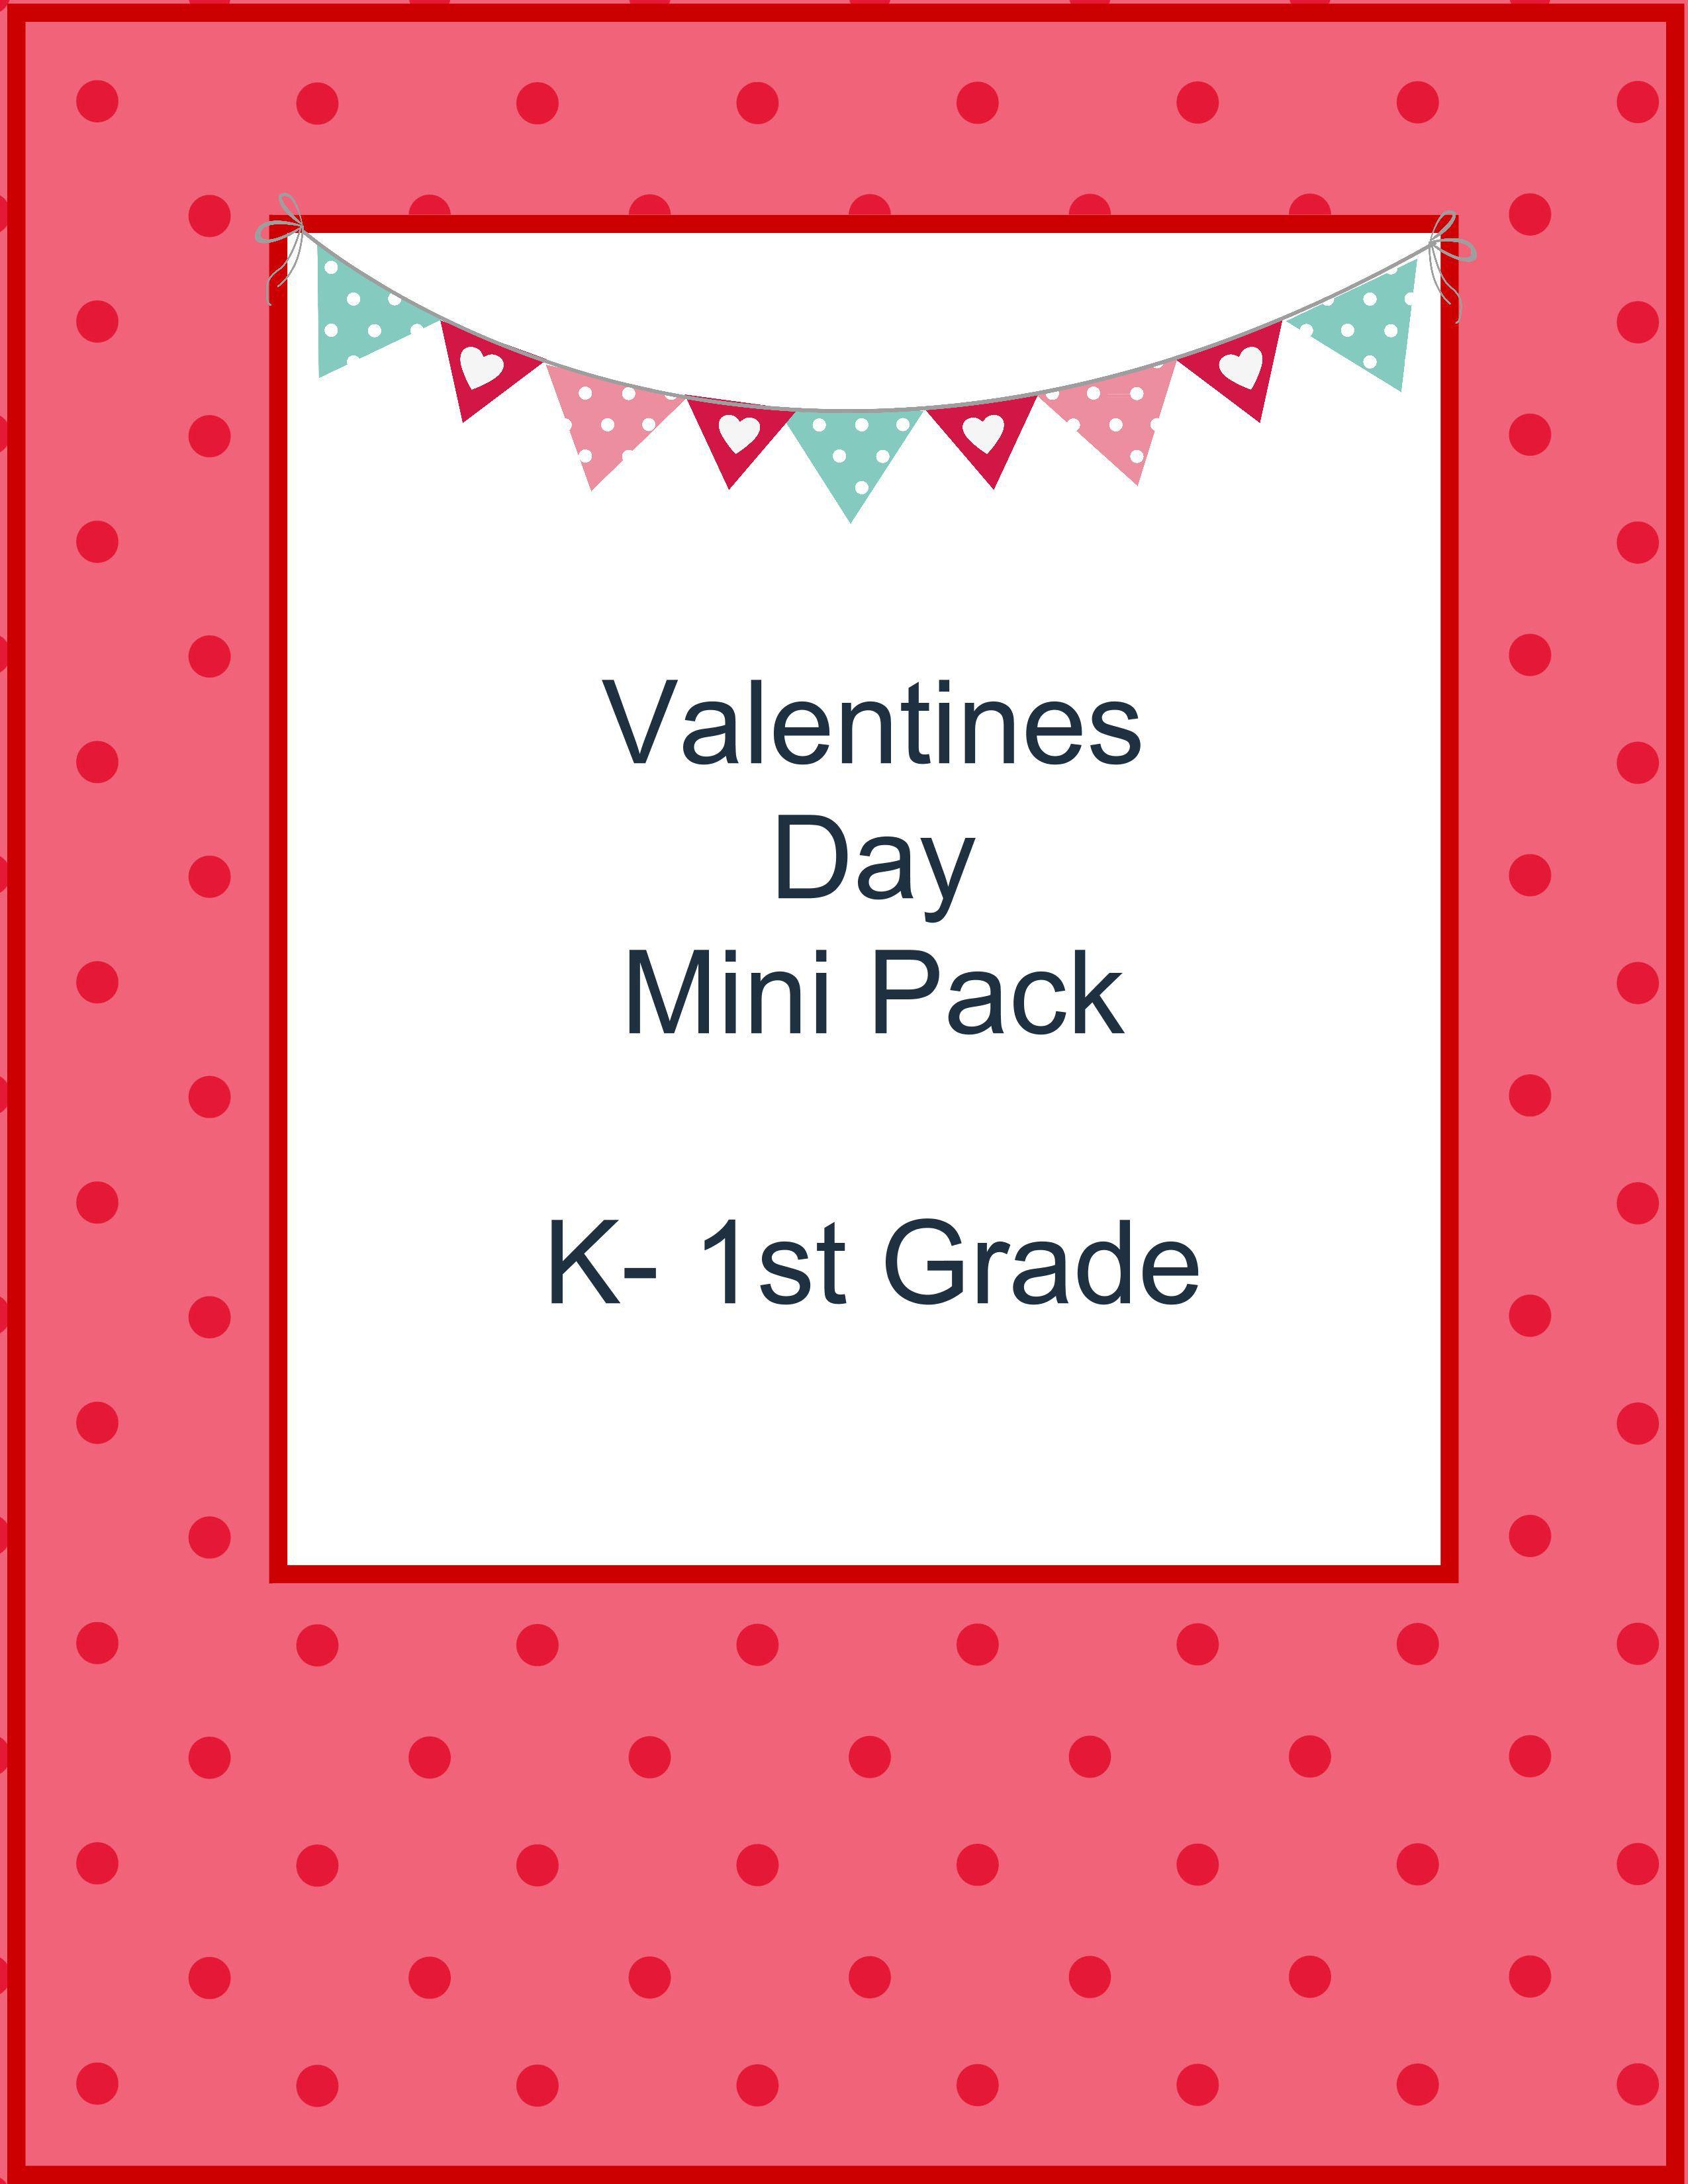 Free Valentines Day Mini Pack K 1st Grade